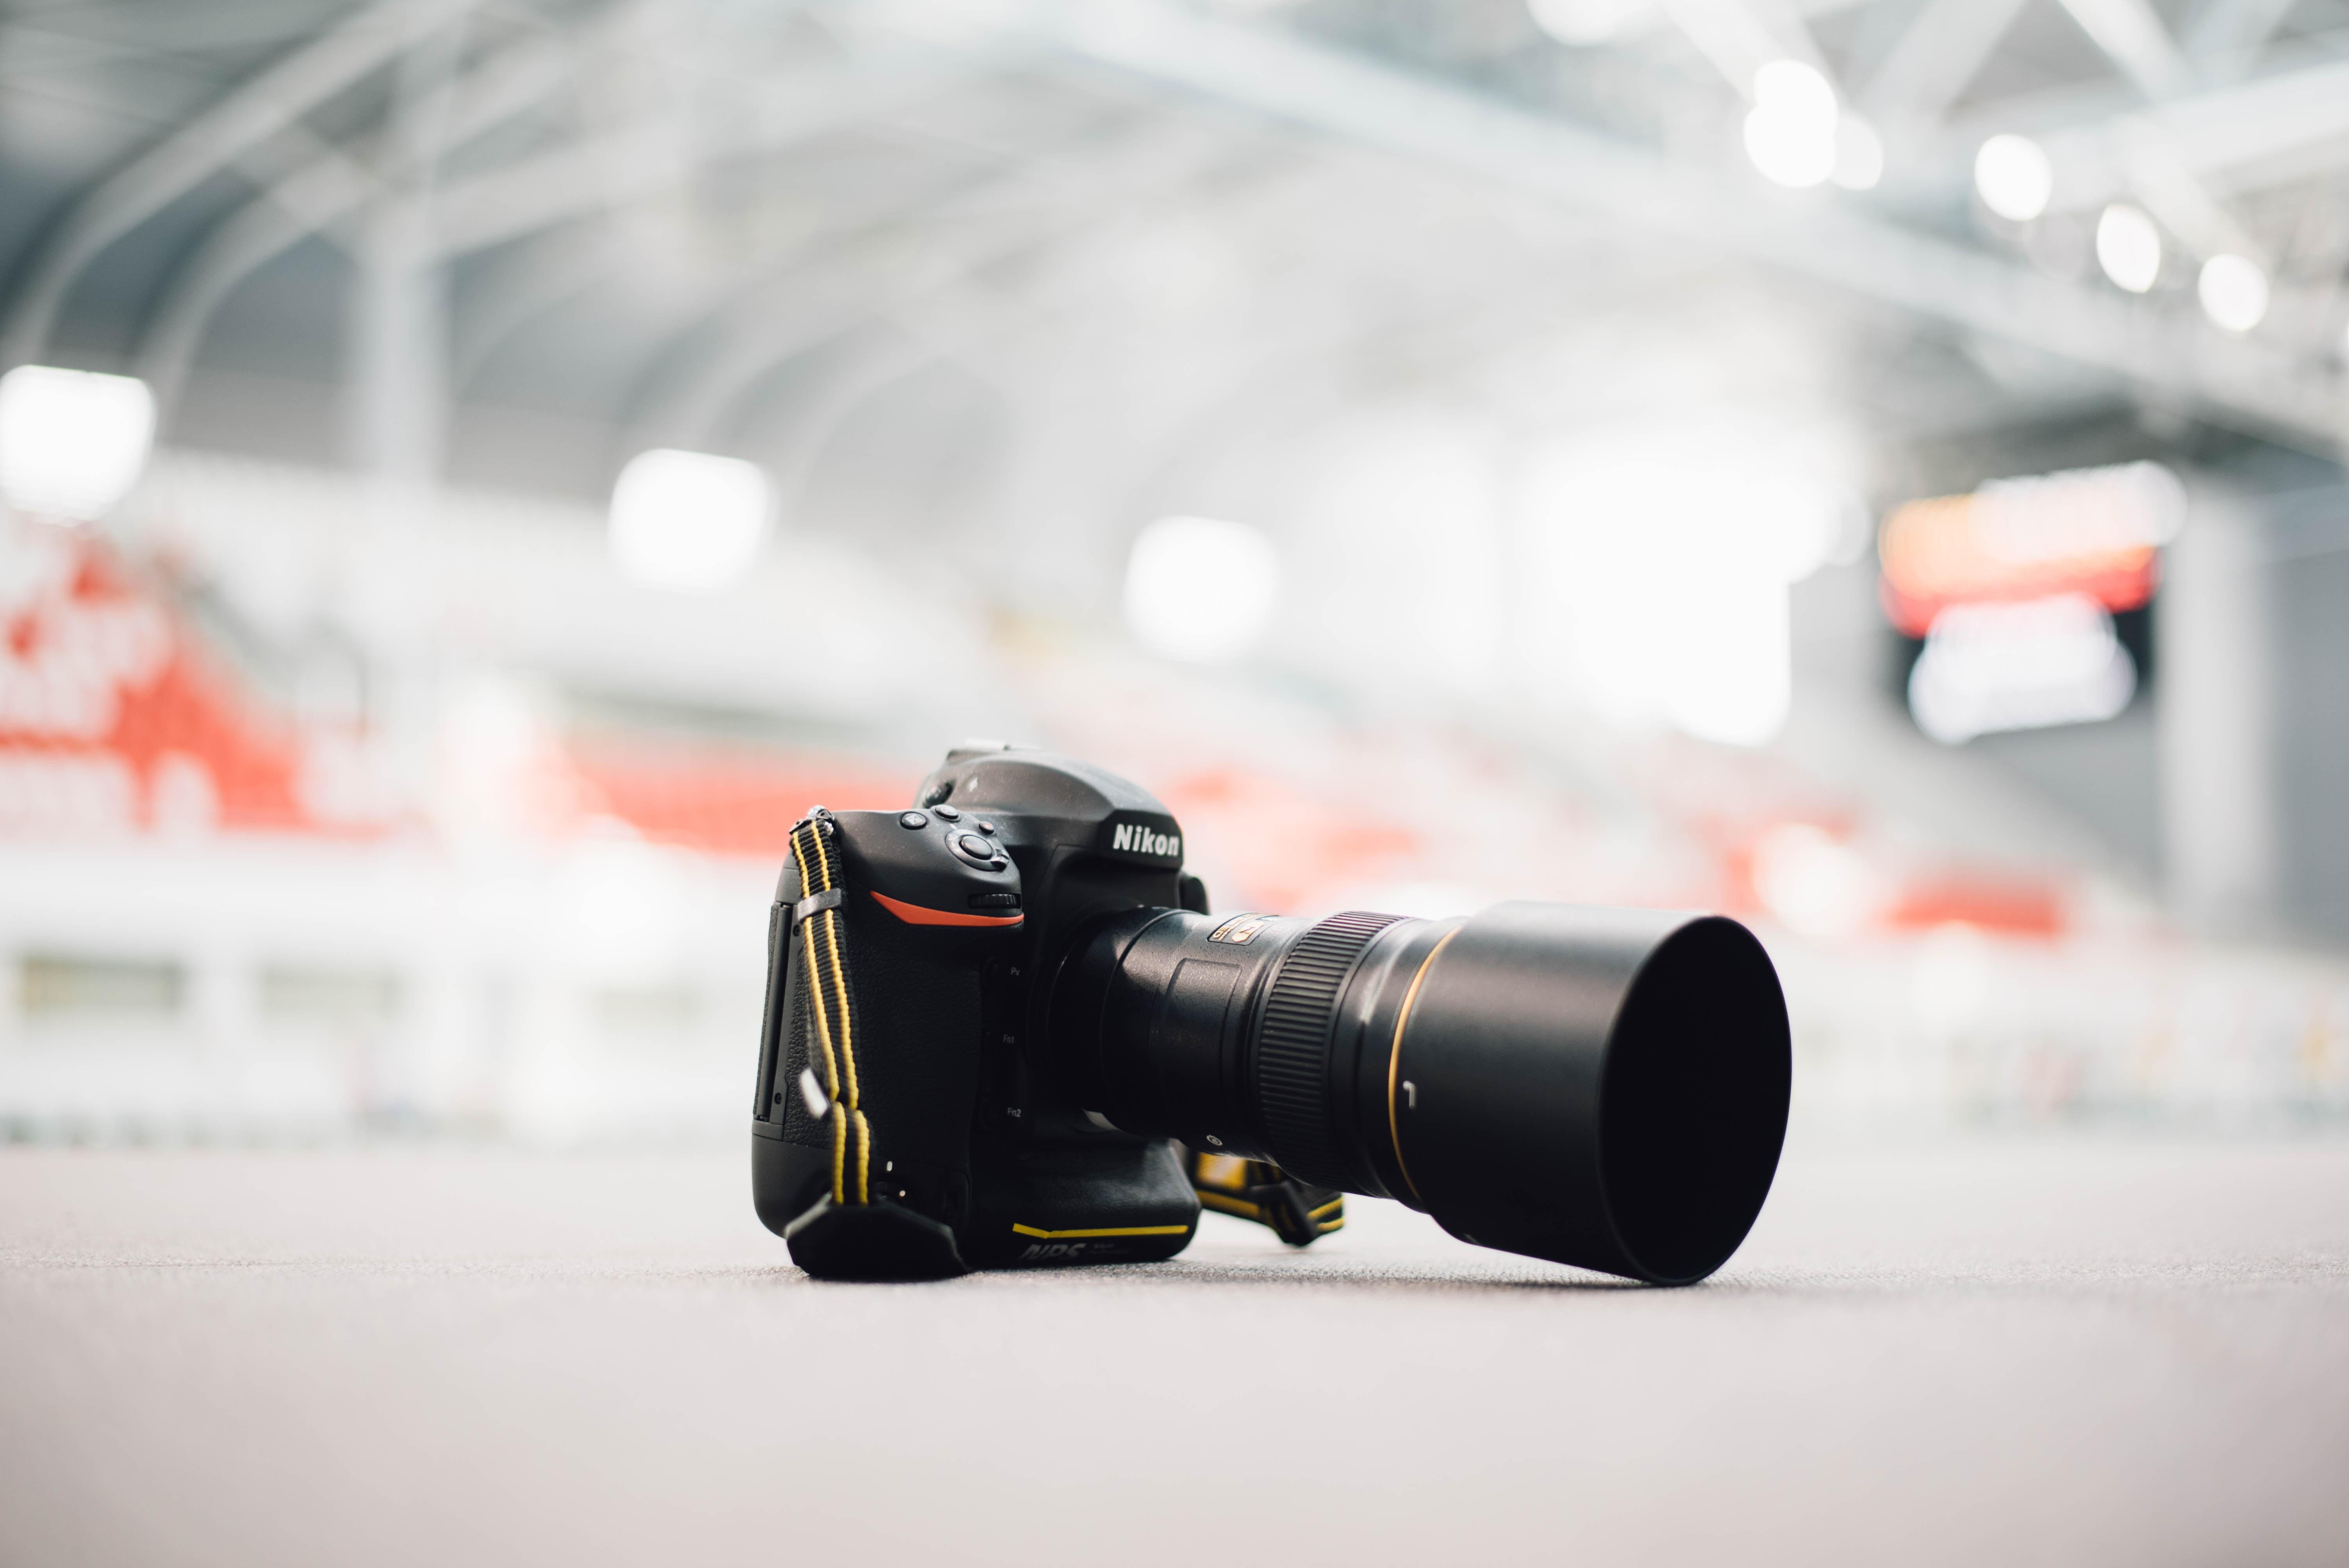 selective focus photography of Nikon DSLR camera on ground